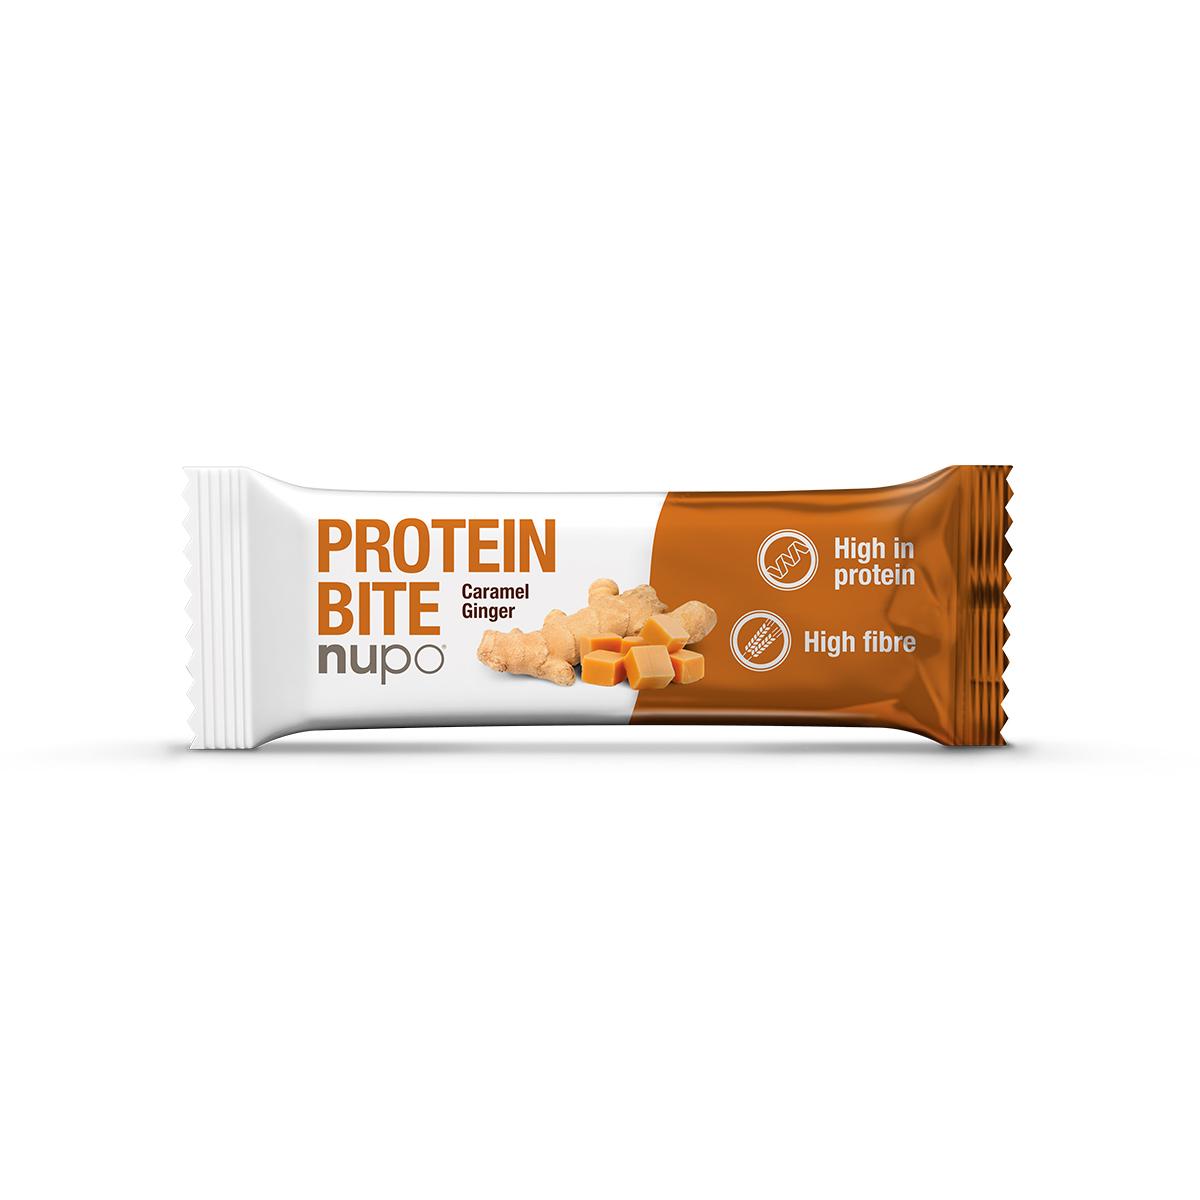 Nupo Protein Bite Caramel Ginger (1 stk.)